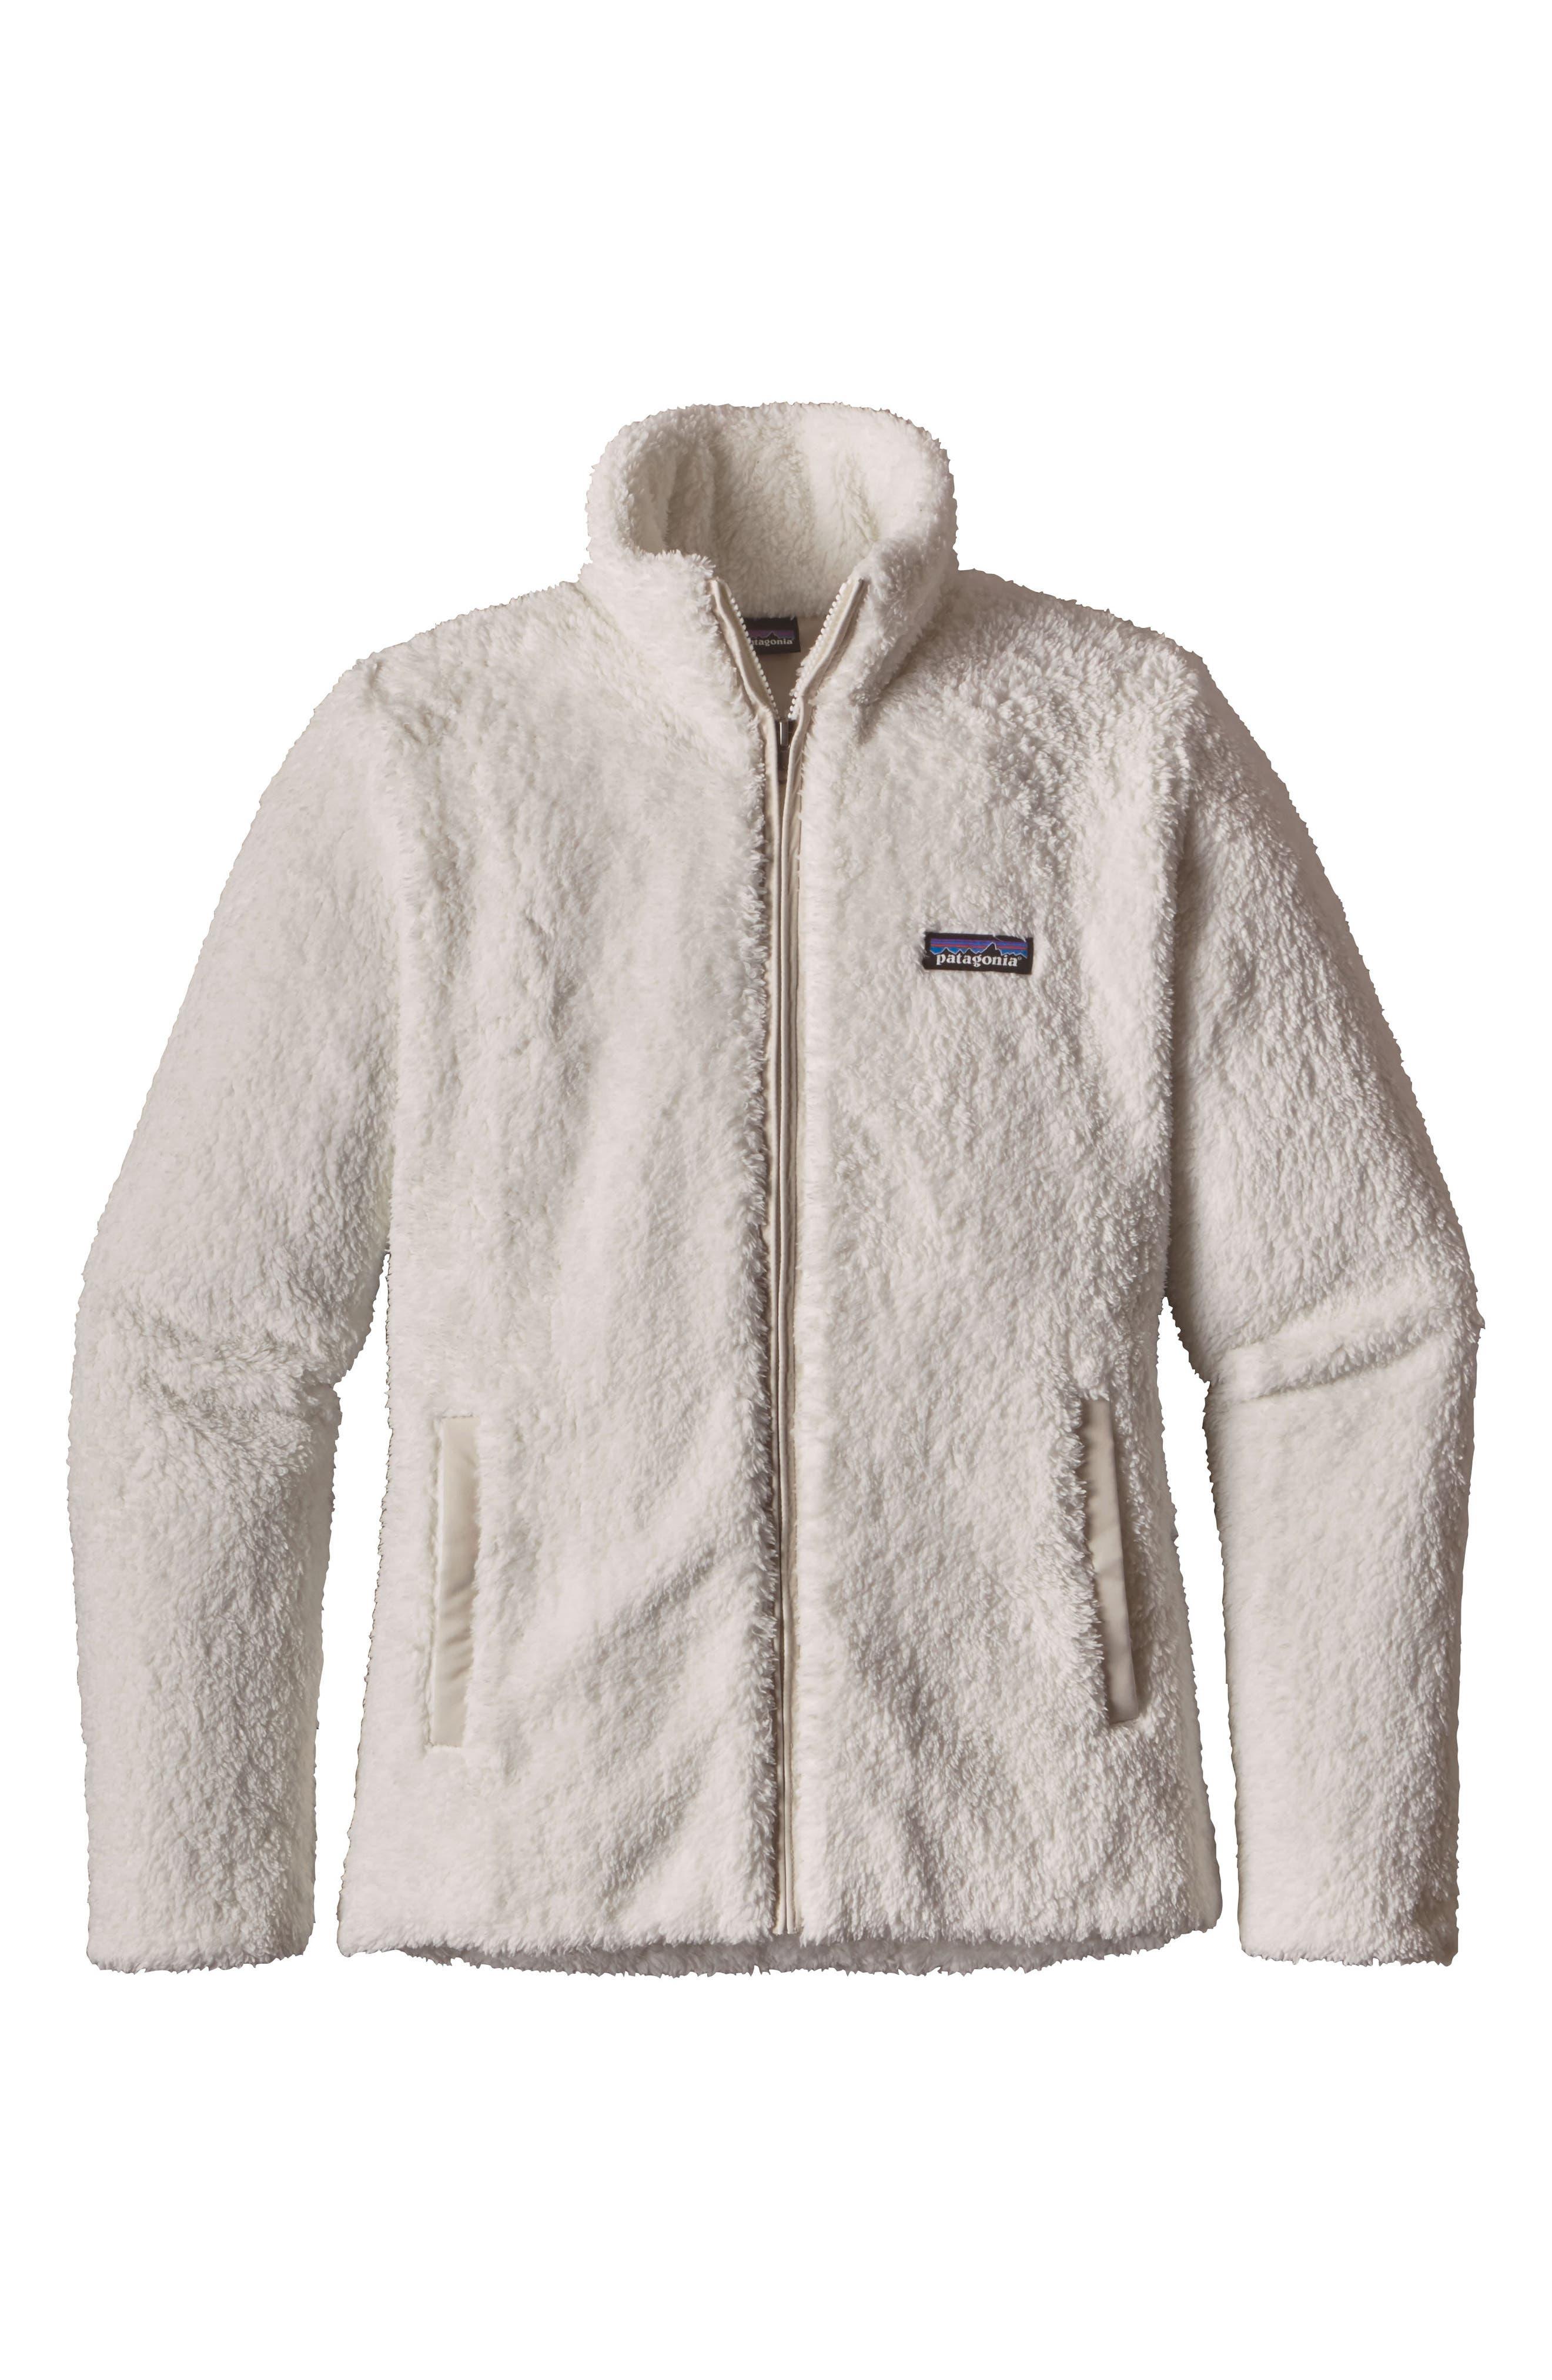 PATAGONIA, Los Gatos Fleece Jacket, Main thumbnail 1, color, BIRCH WHITE